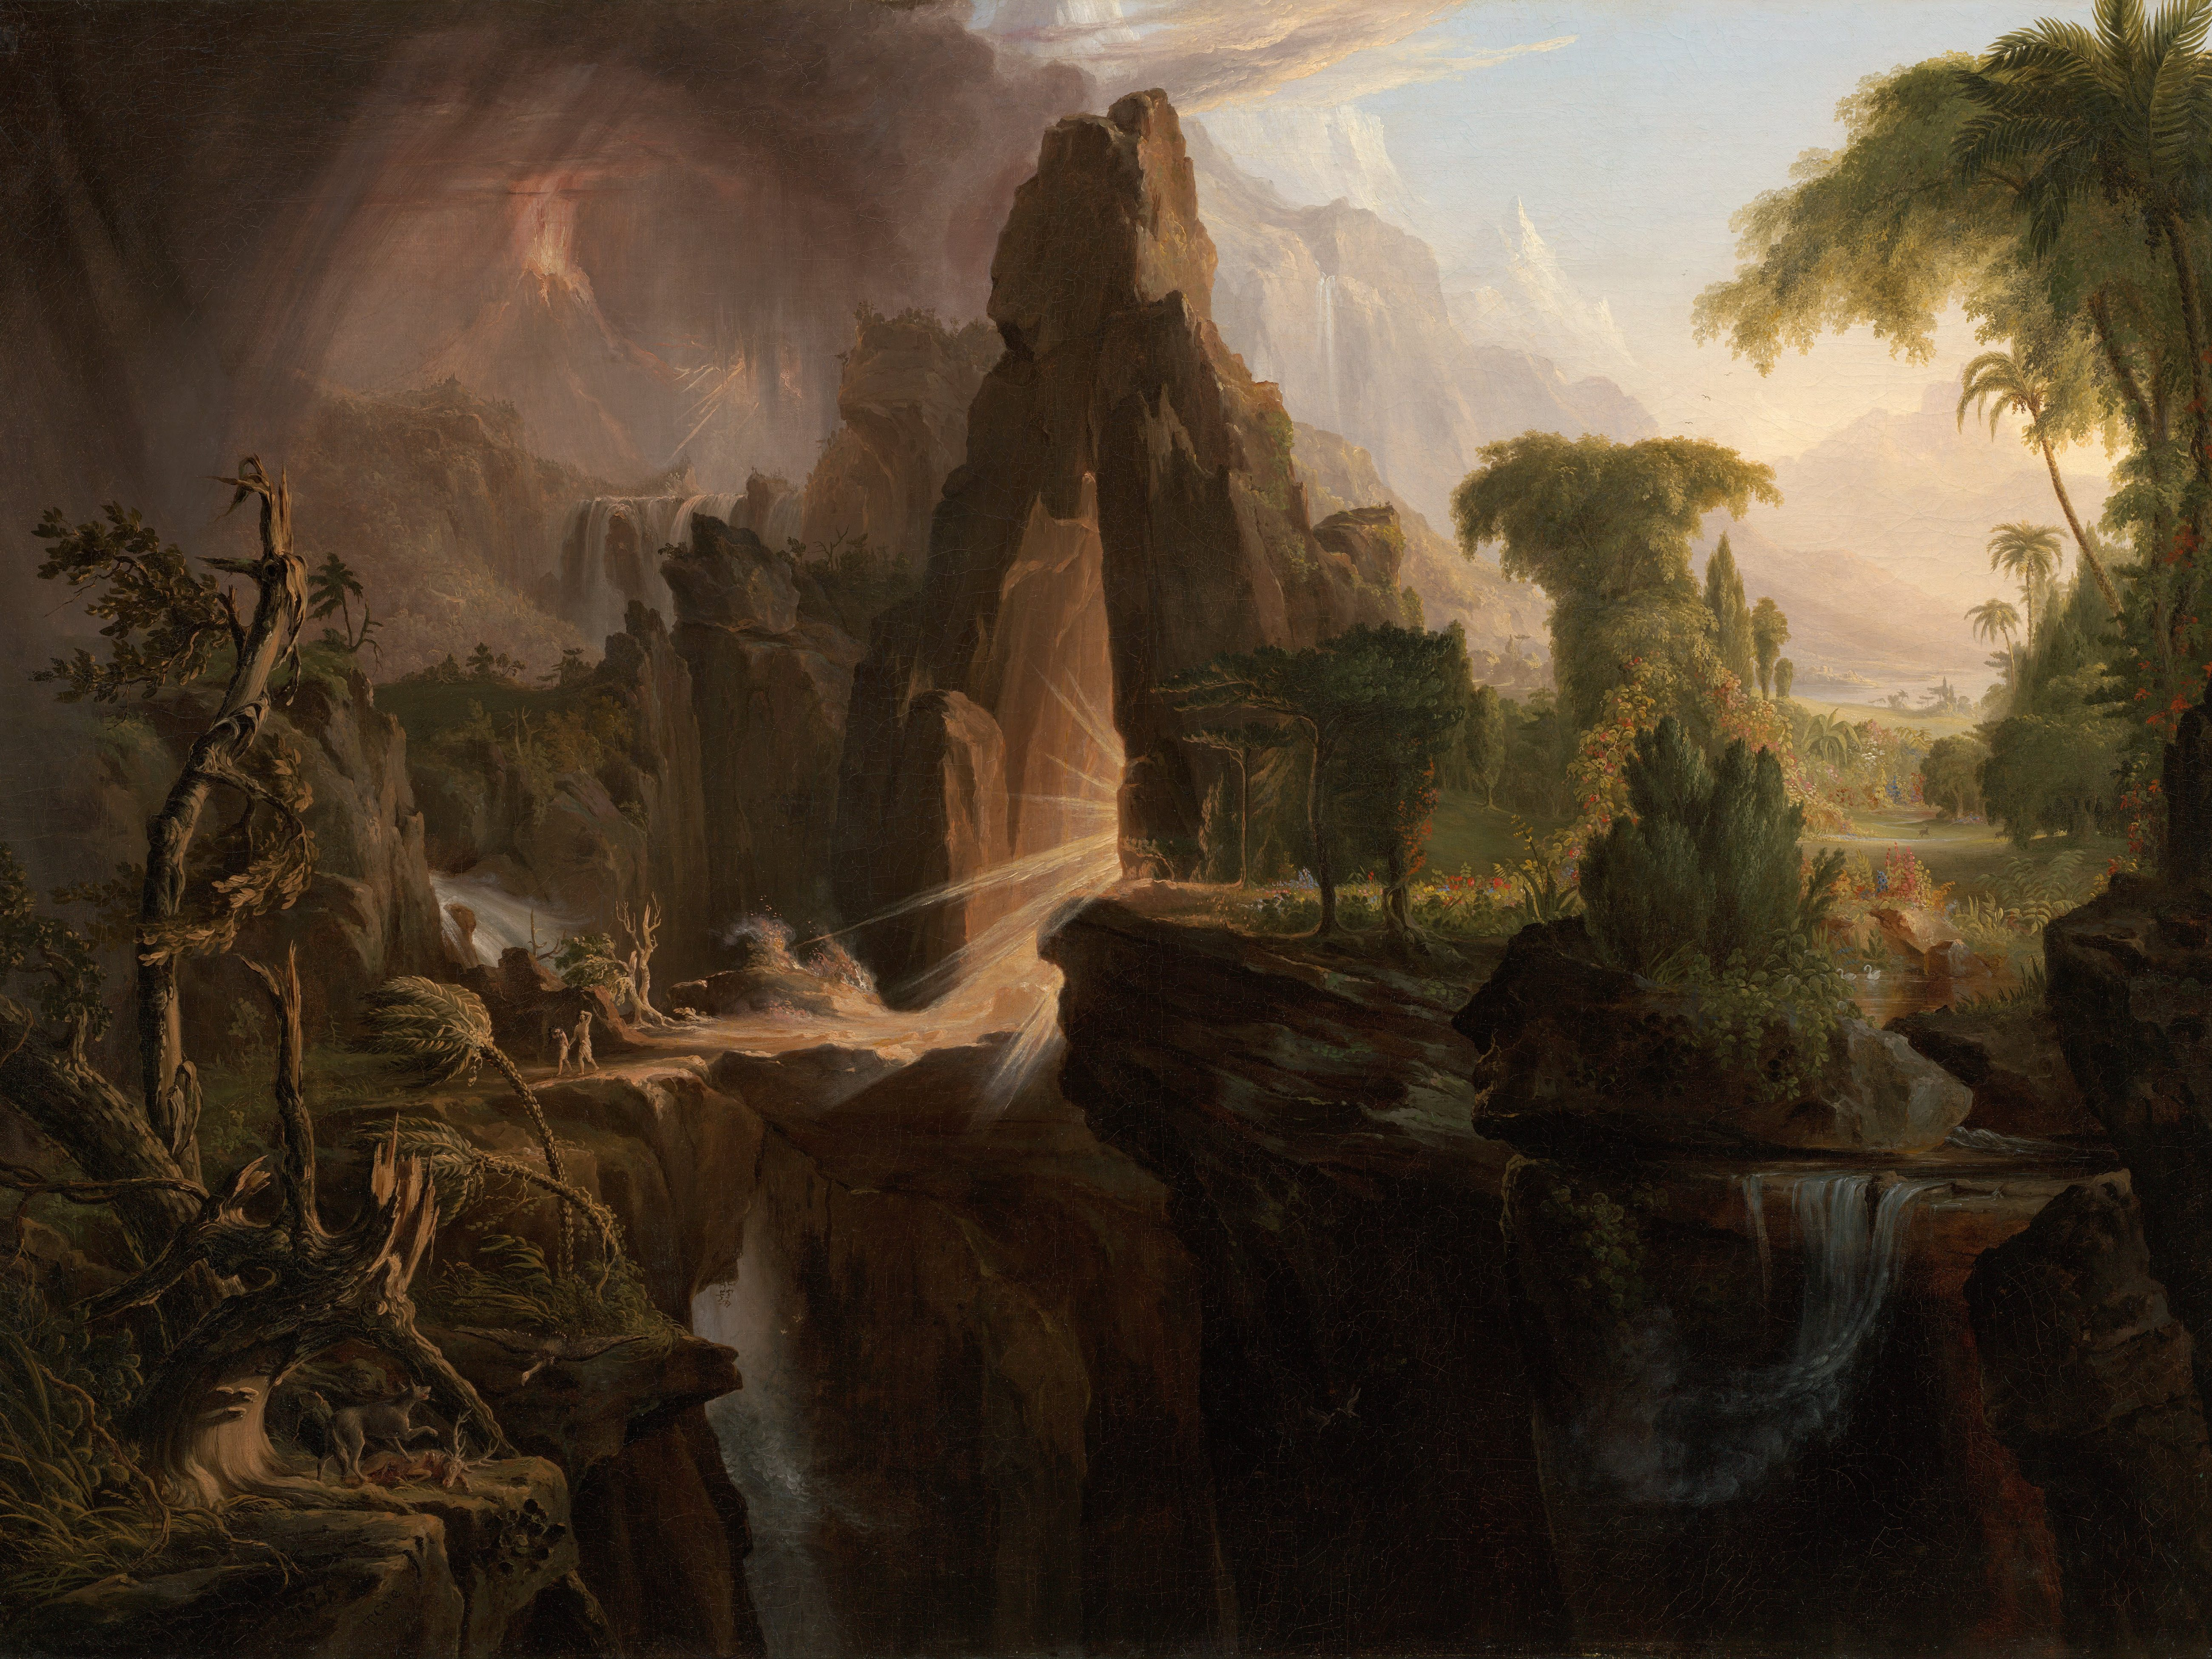 Thomas Cole, Expulsion from Eden